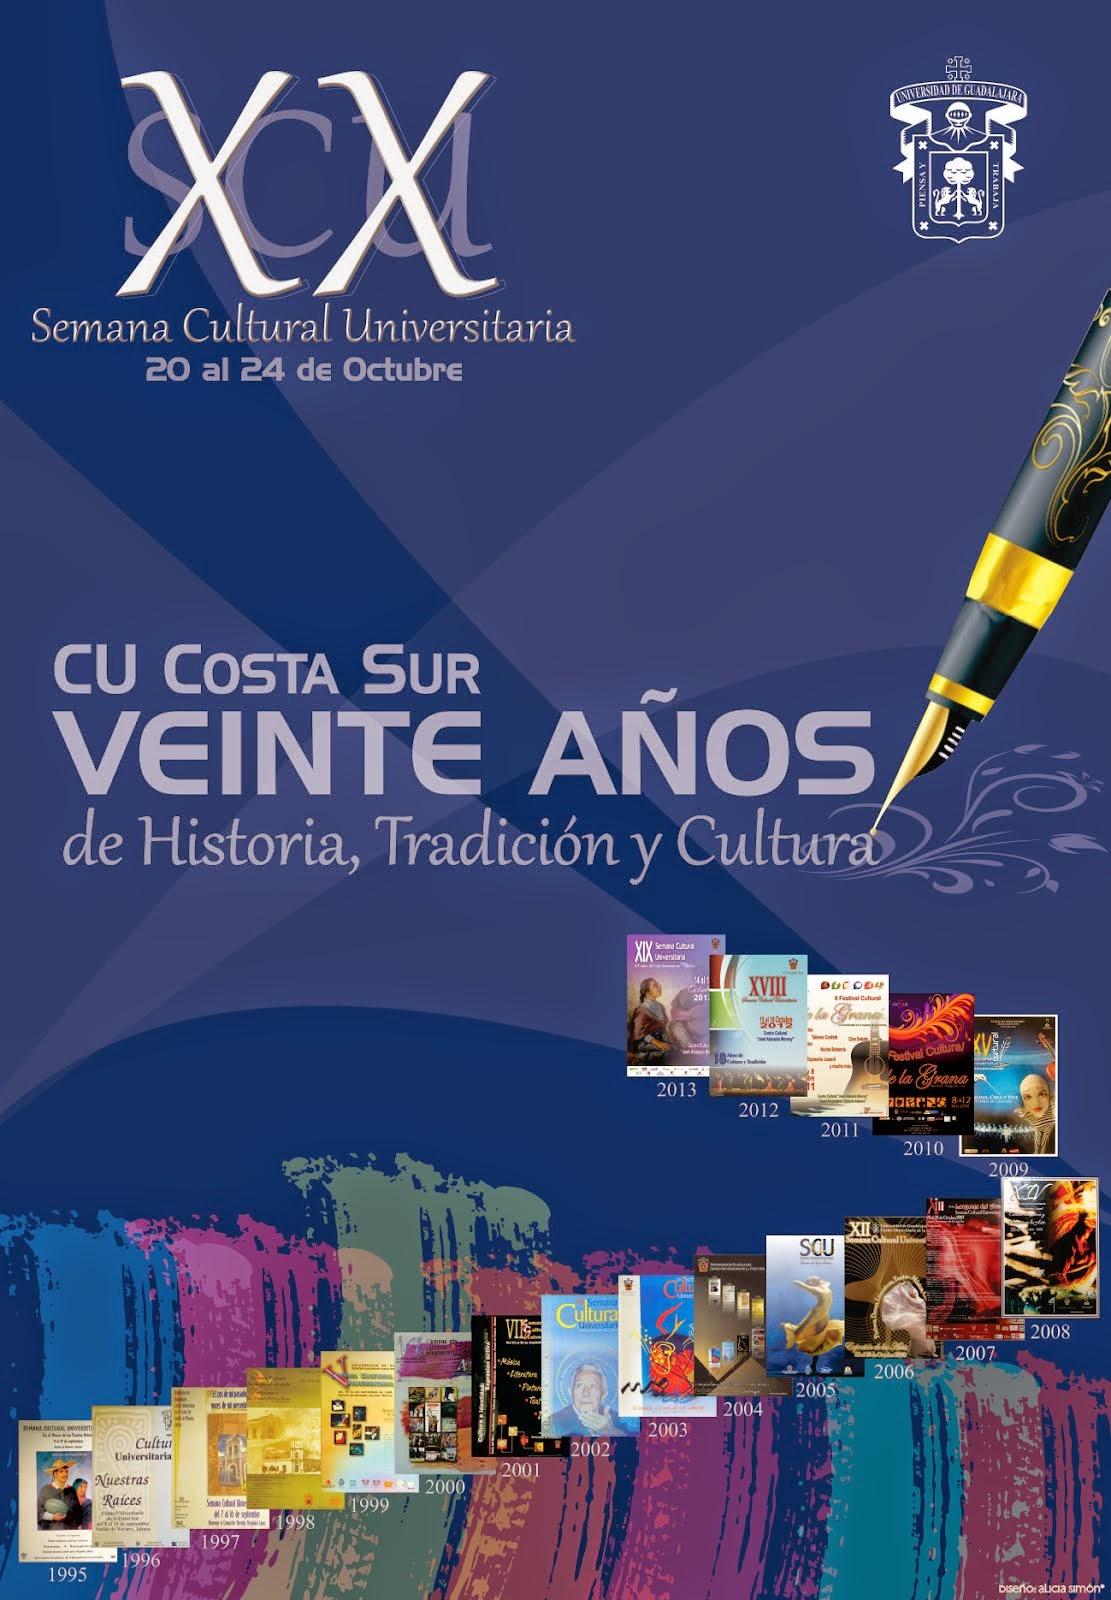 XX Semana Cultural Universitaria